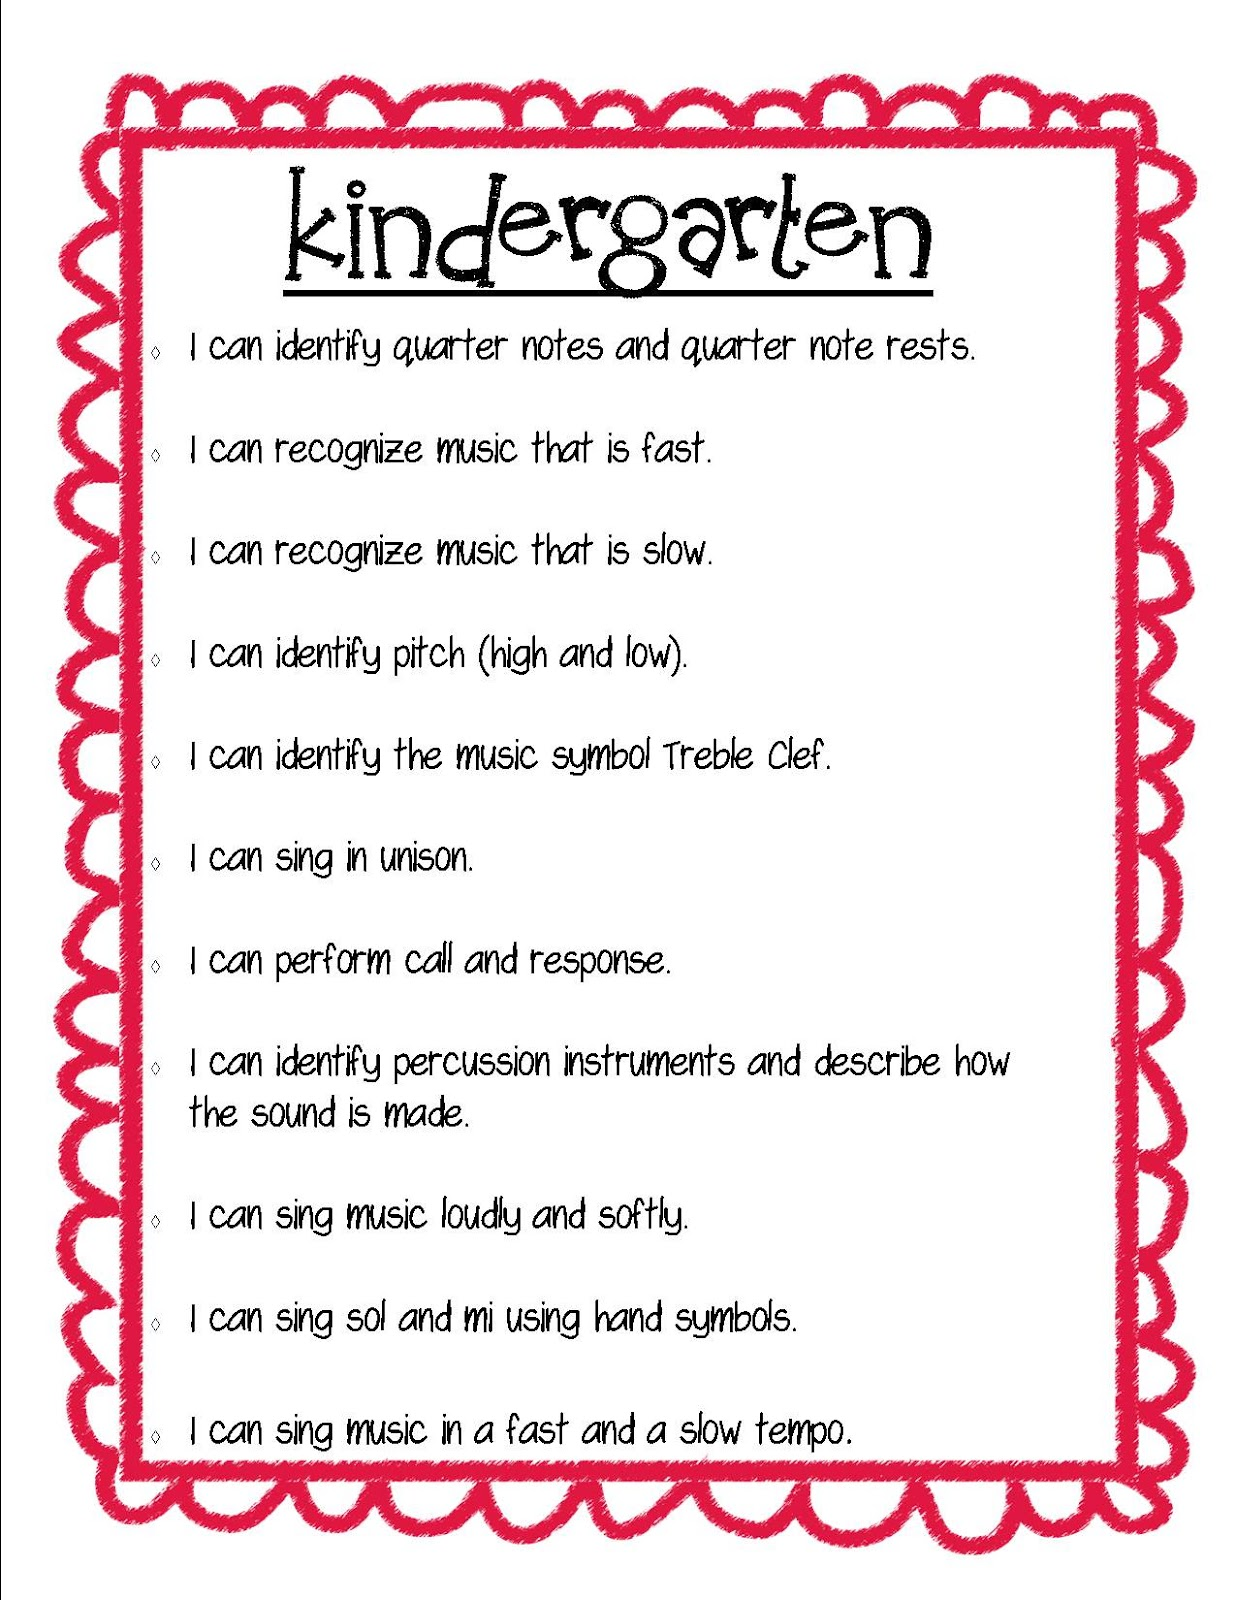 Worksheet Kindergarten Short Stories so la mi elementary music class kindergartenfirst grade